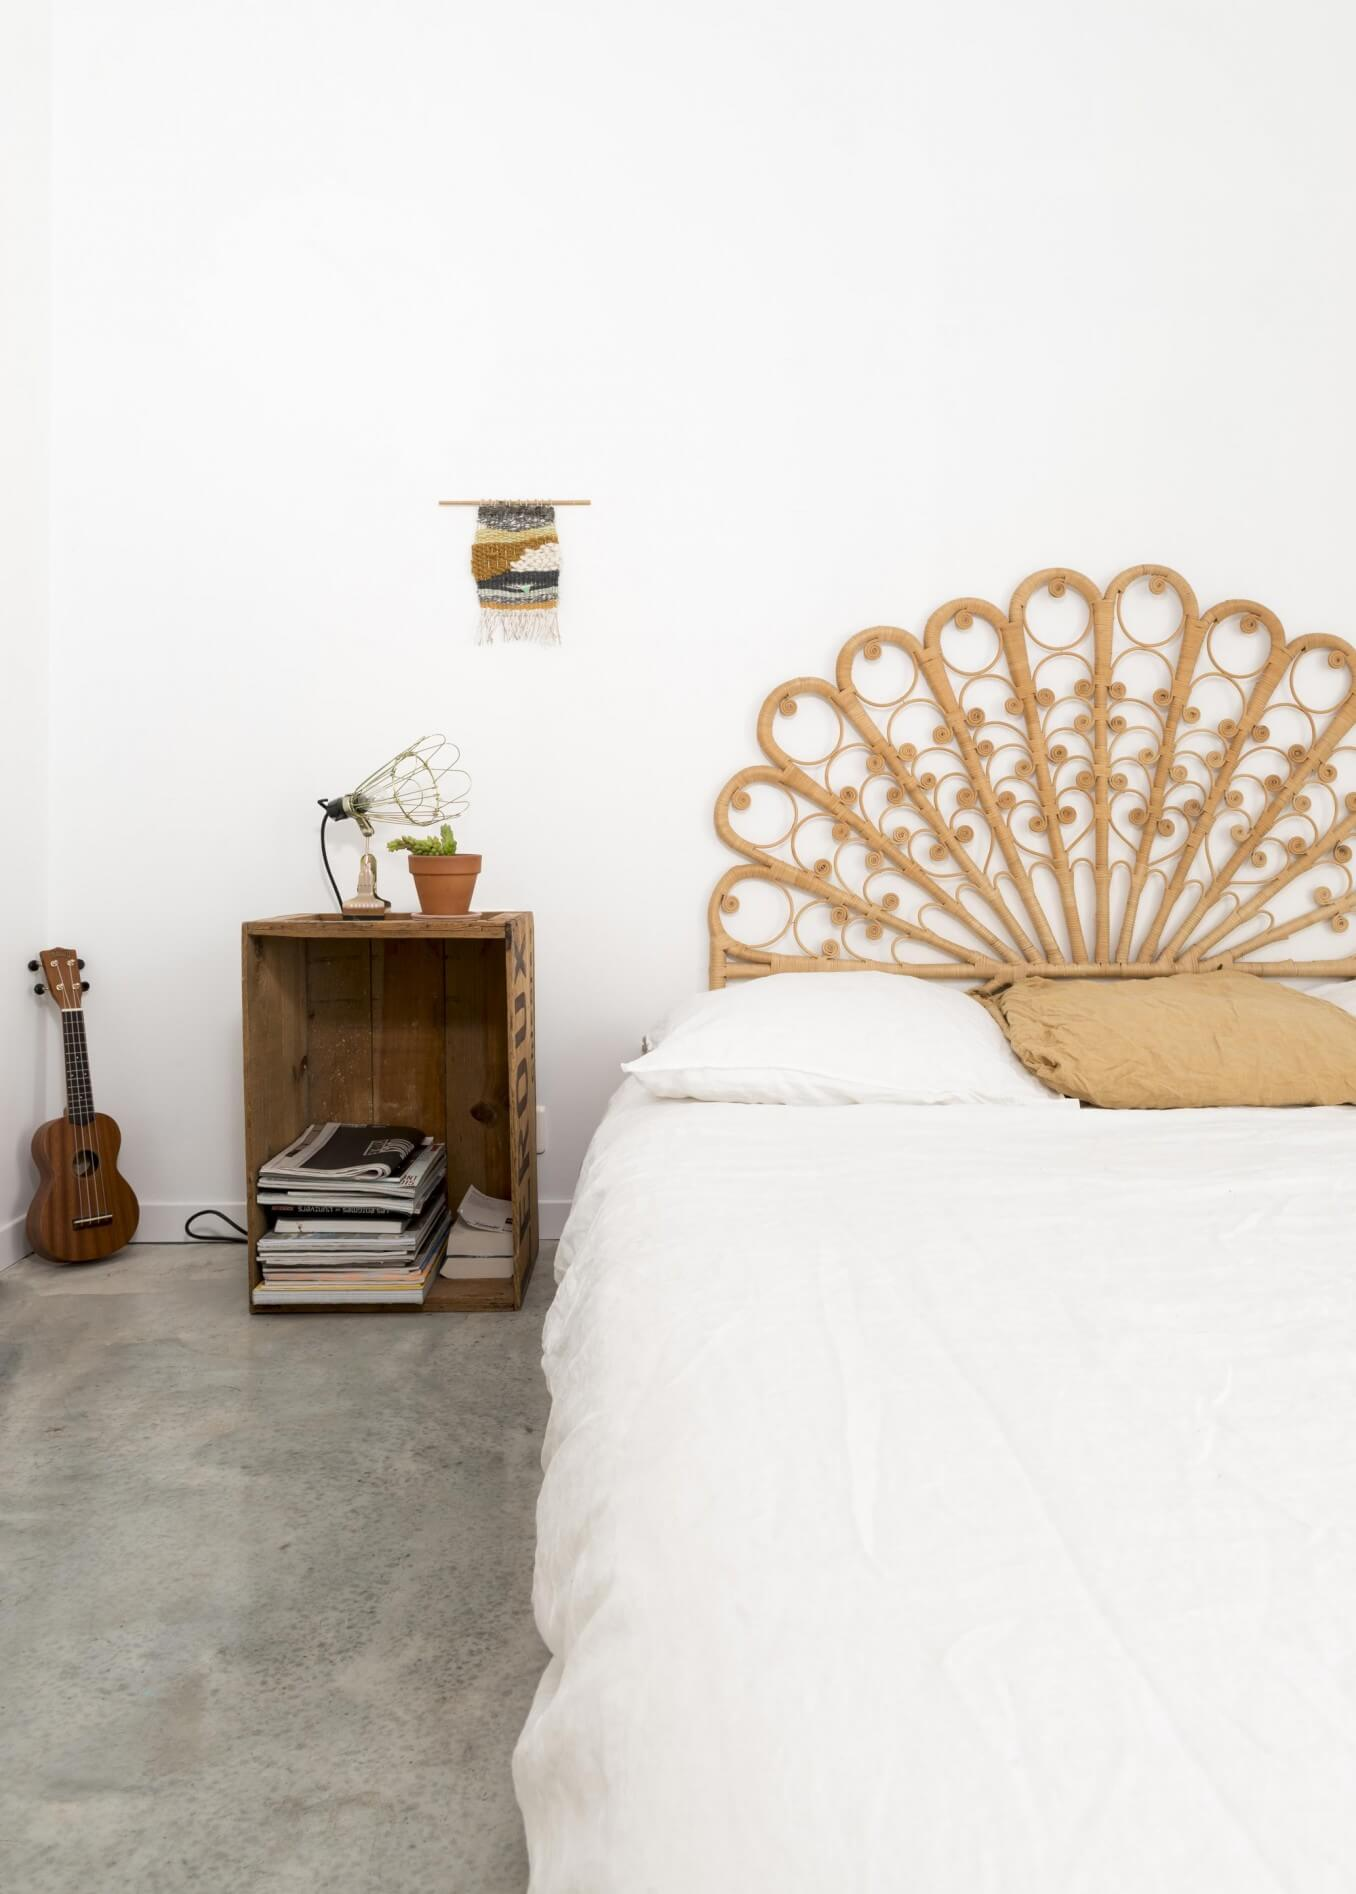 Tête de lit en rotin vintage